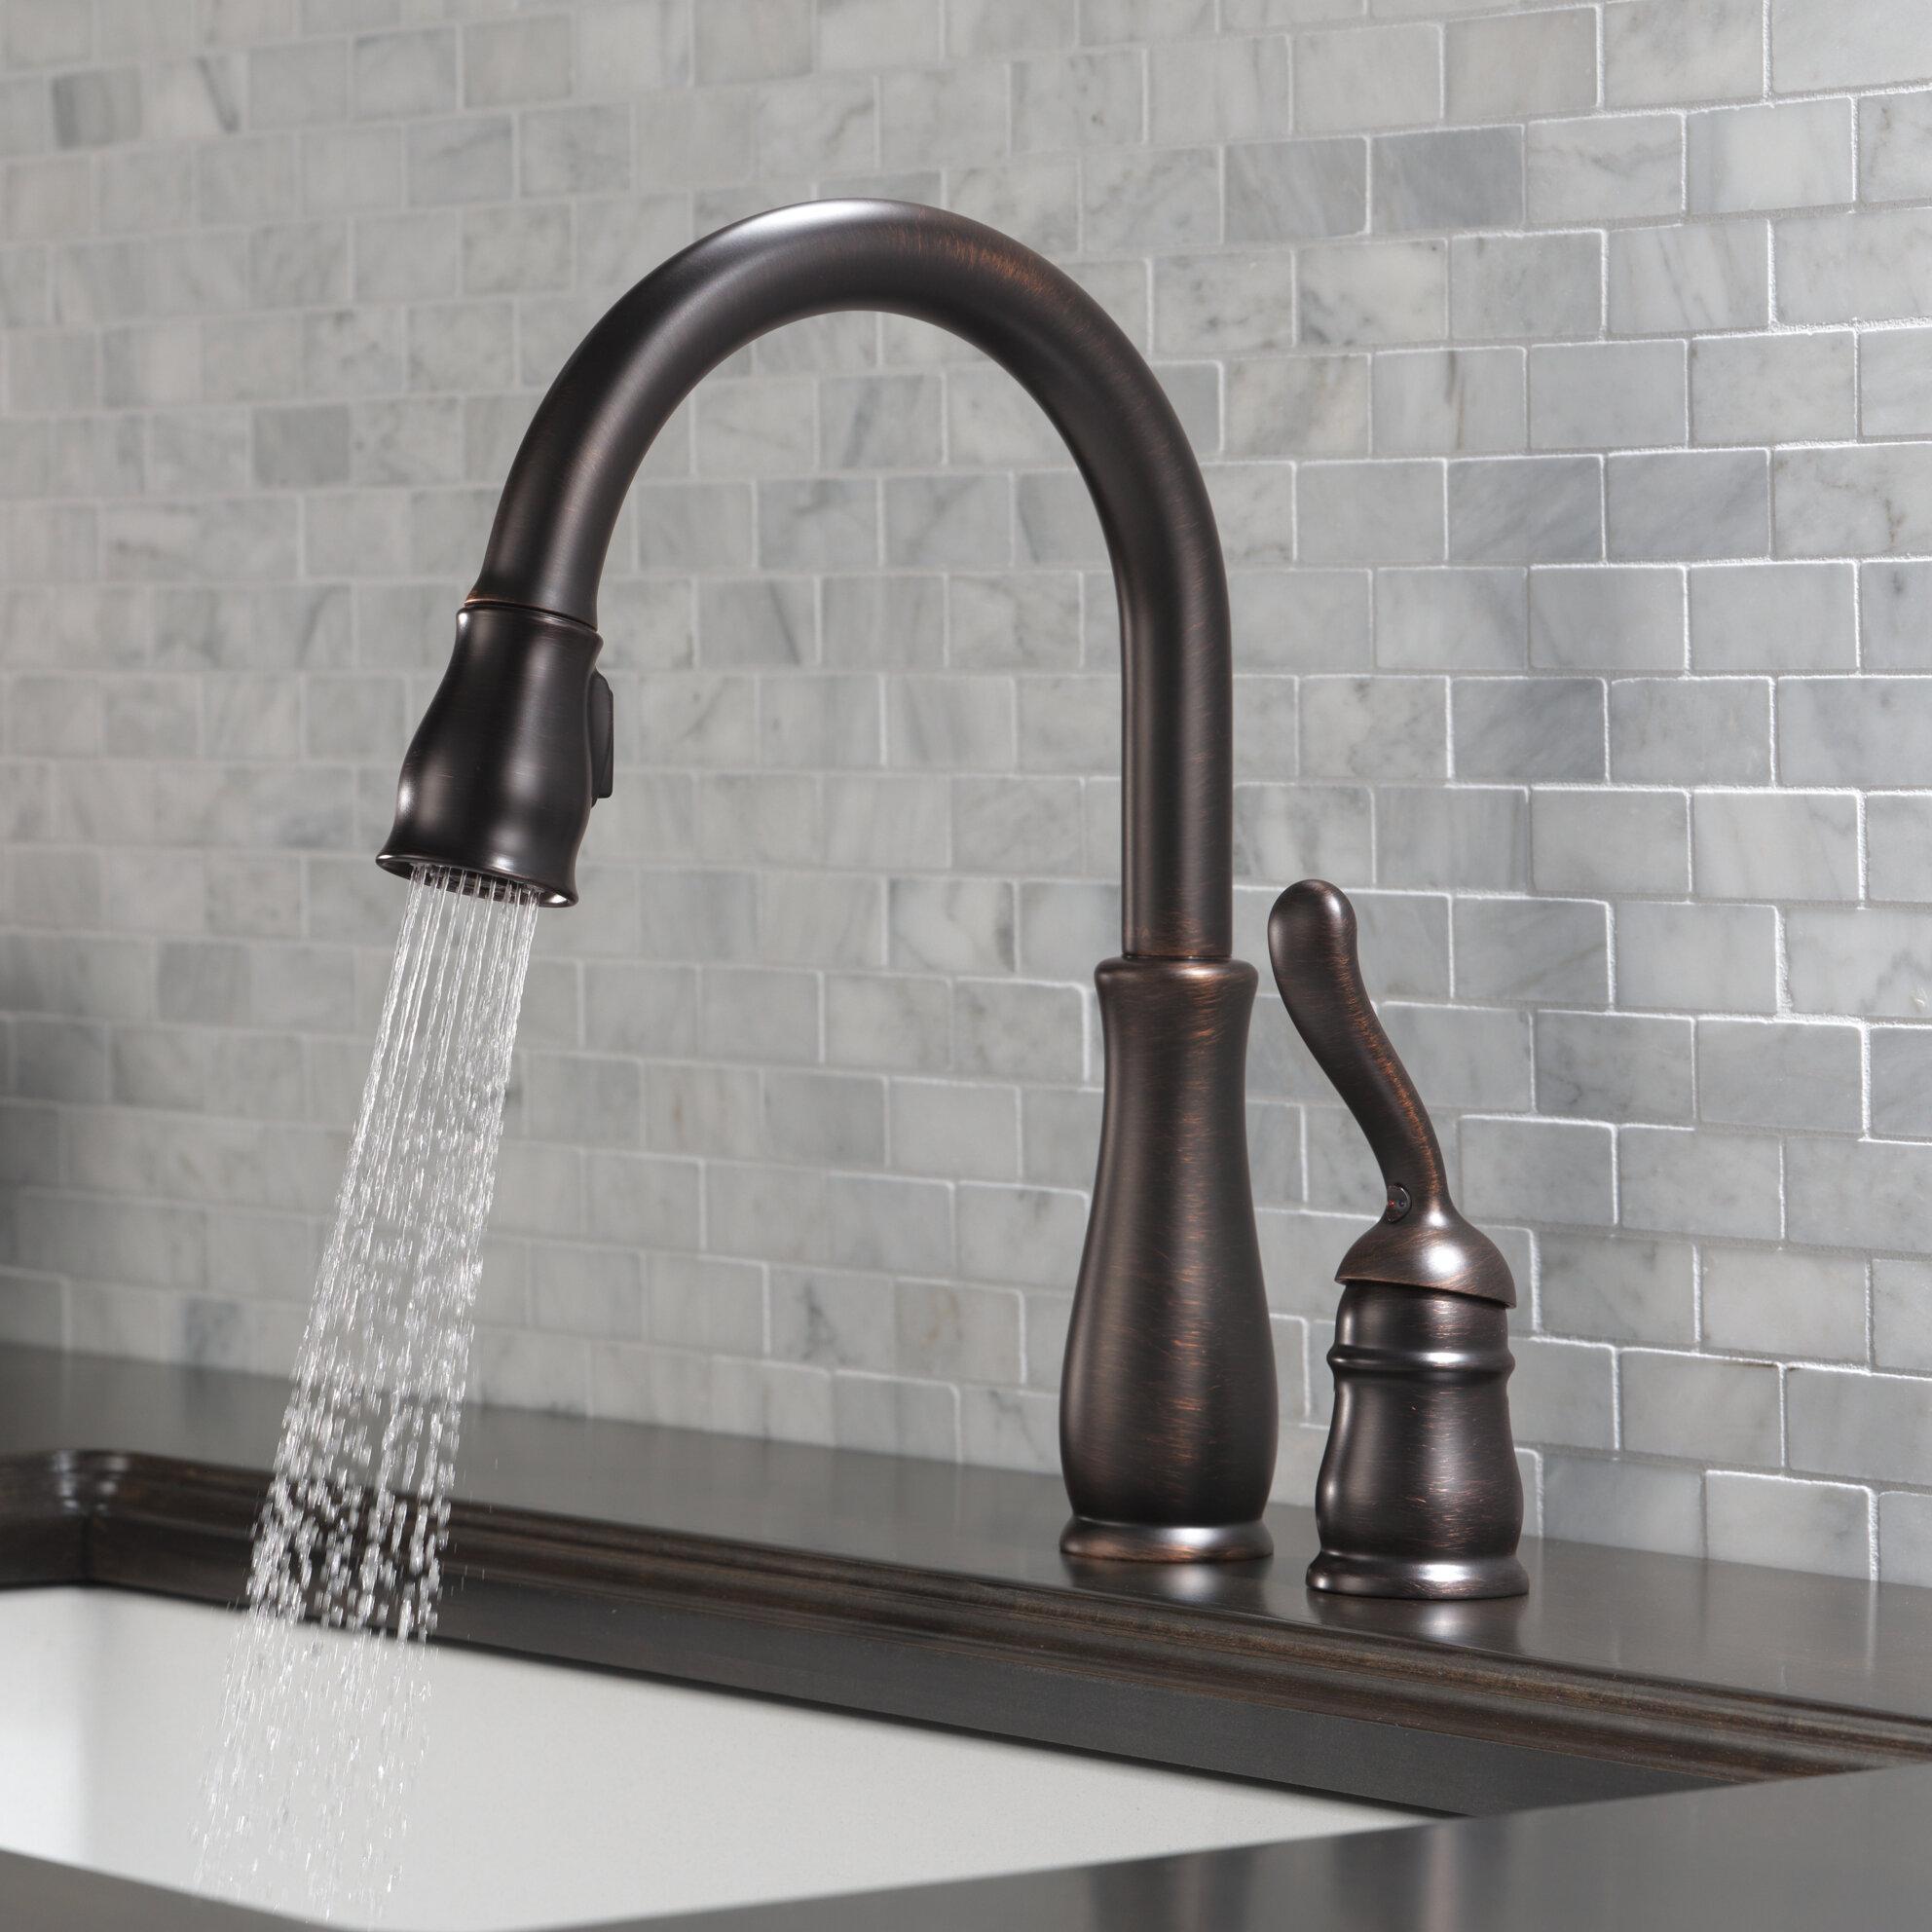 978 Rb Dst Dst Ar Dst Delta Leland Pull Down Single Handle Kitchen Faucet Reviews Wayfair